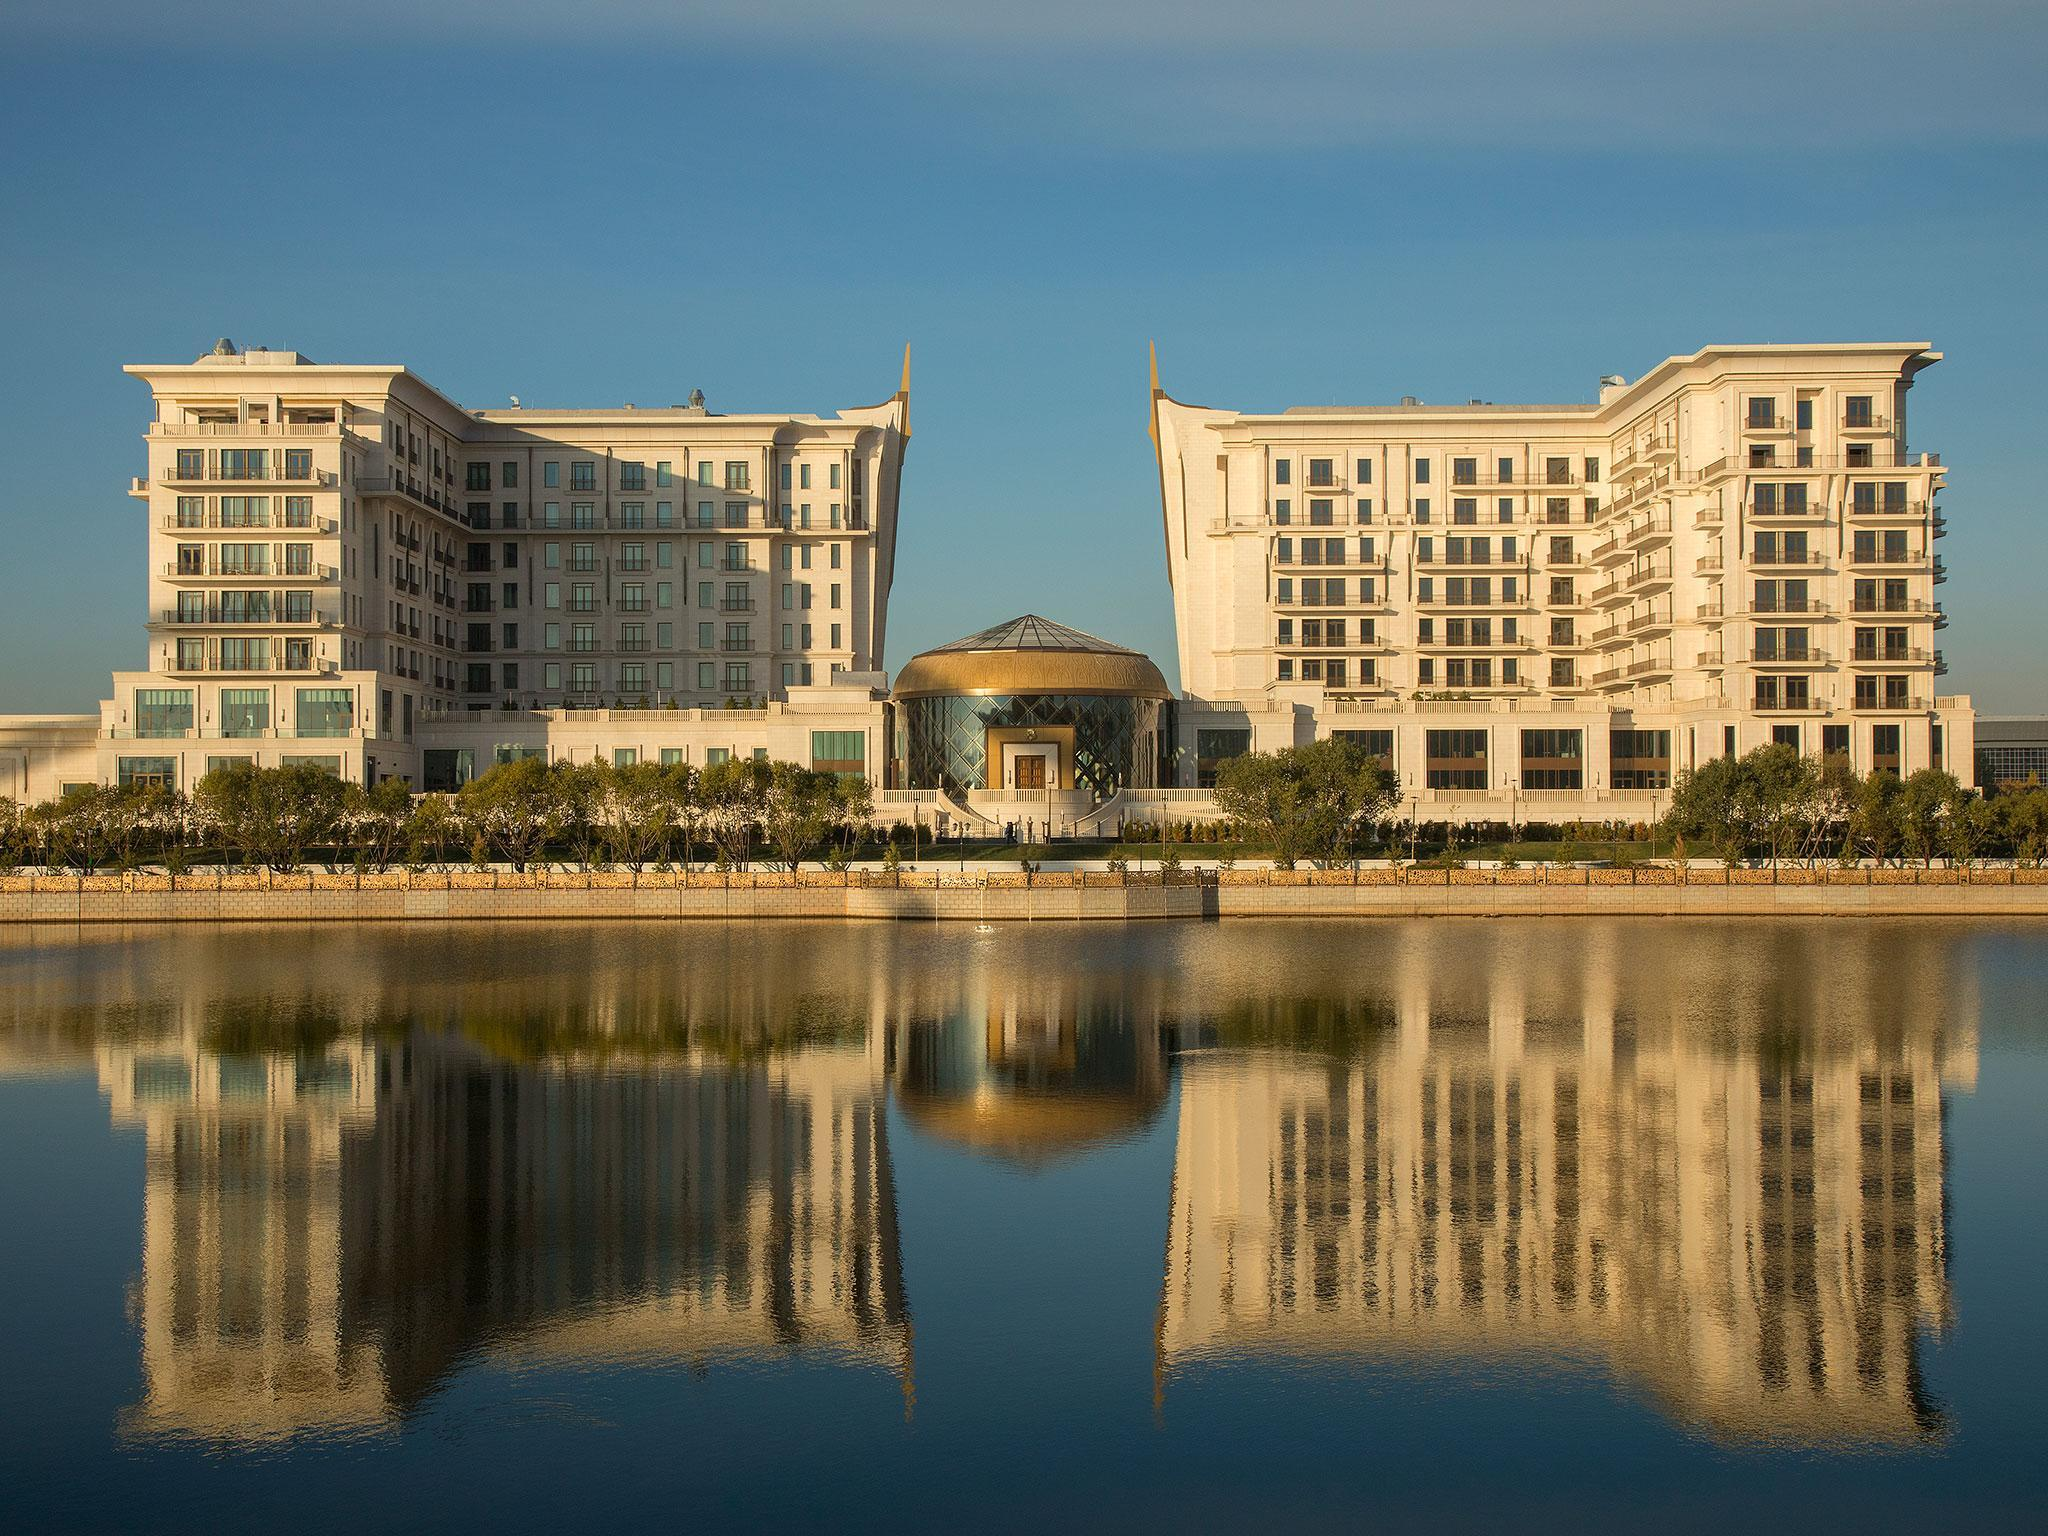 The St. Regis Astana, Tselinogradskiy